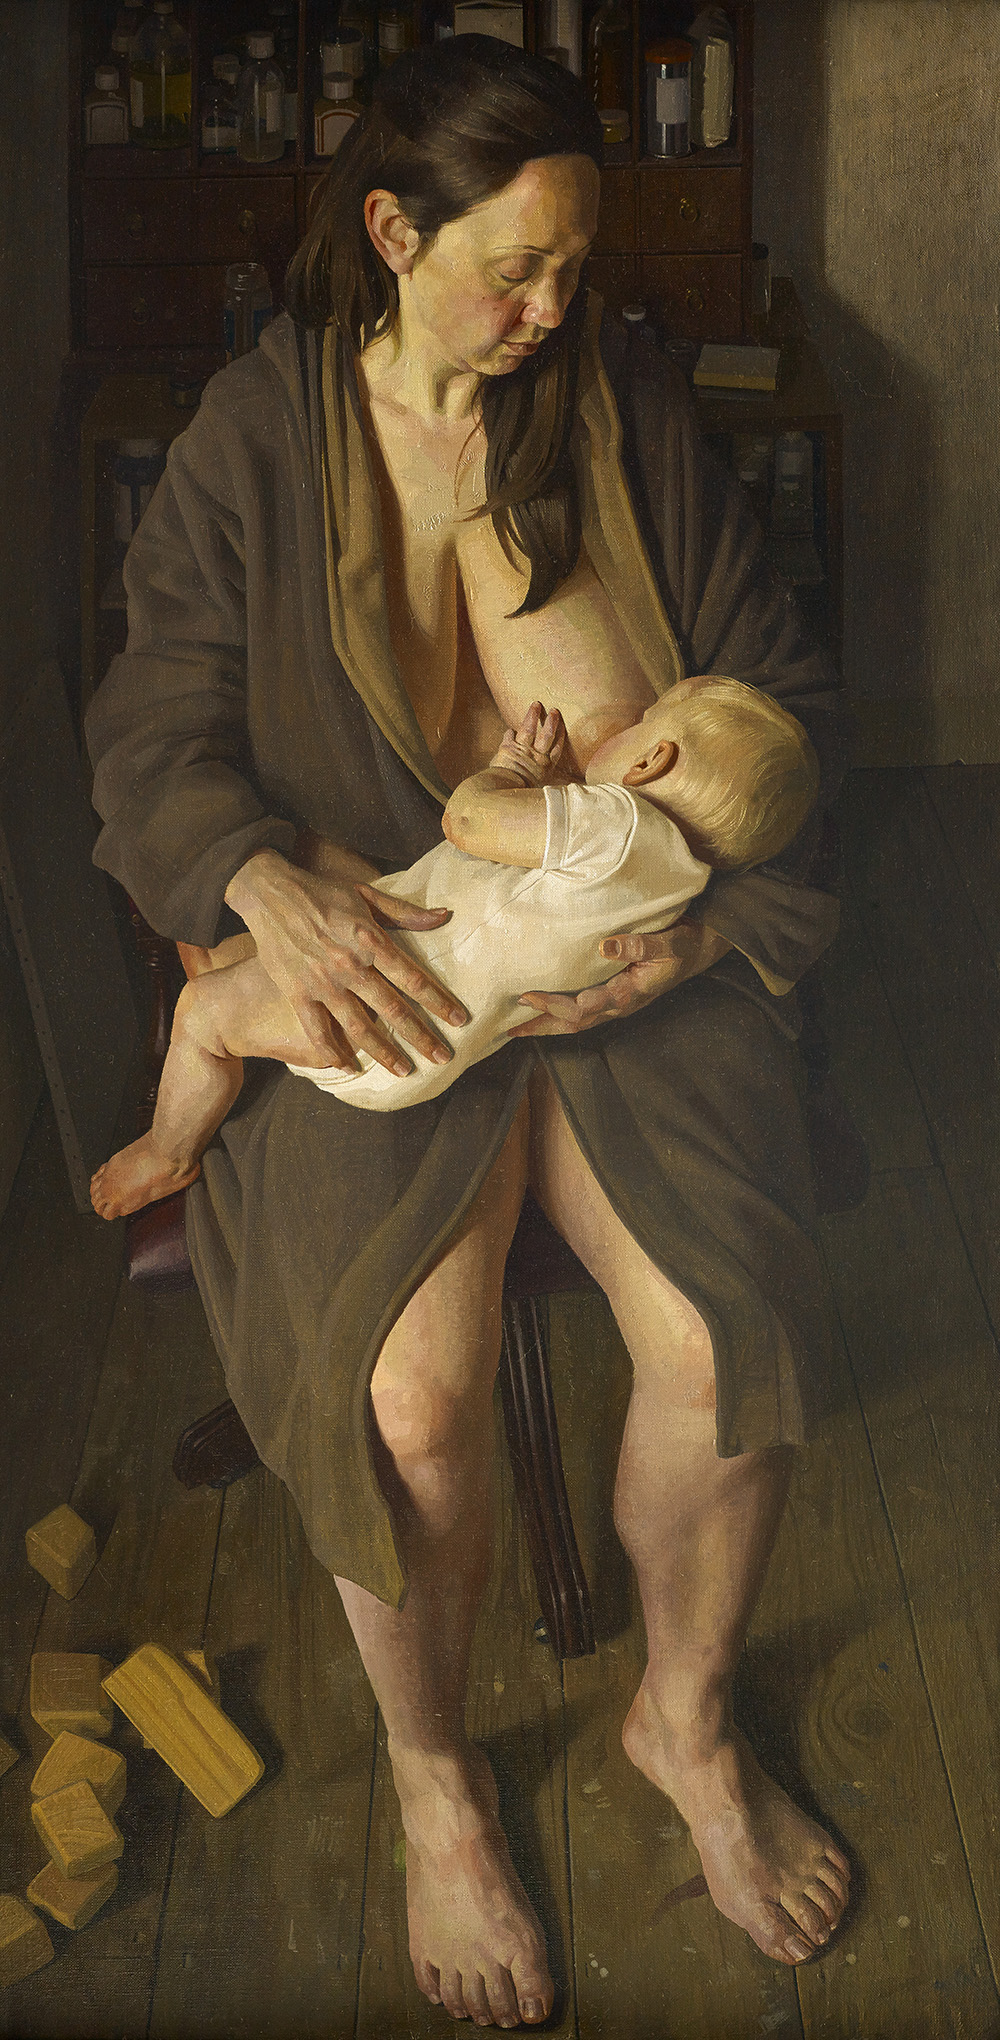 'Breech!', de Benjamin Sullivan © Benjamin Sullivan